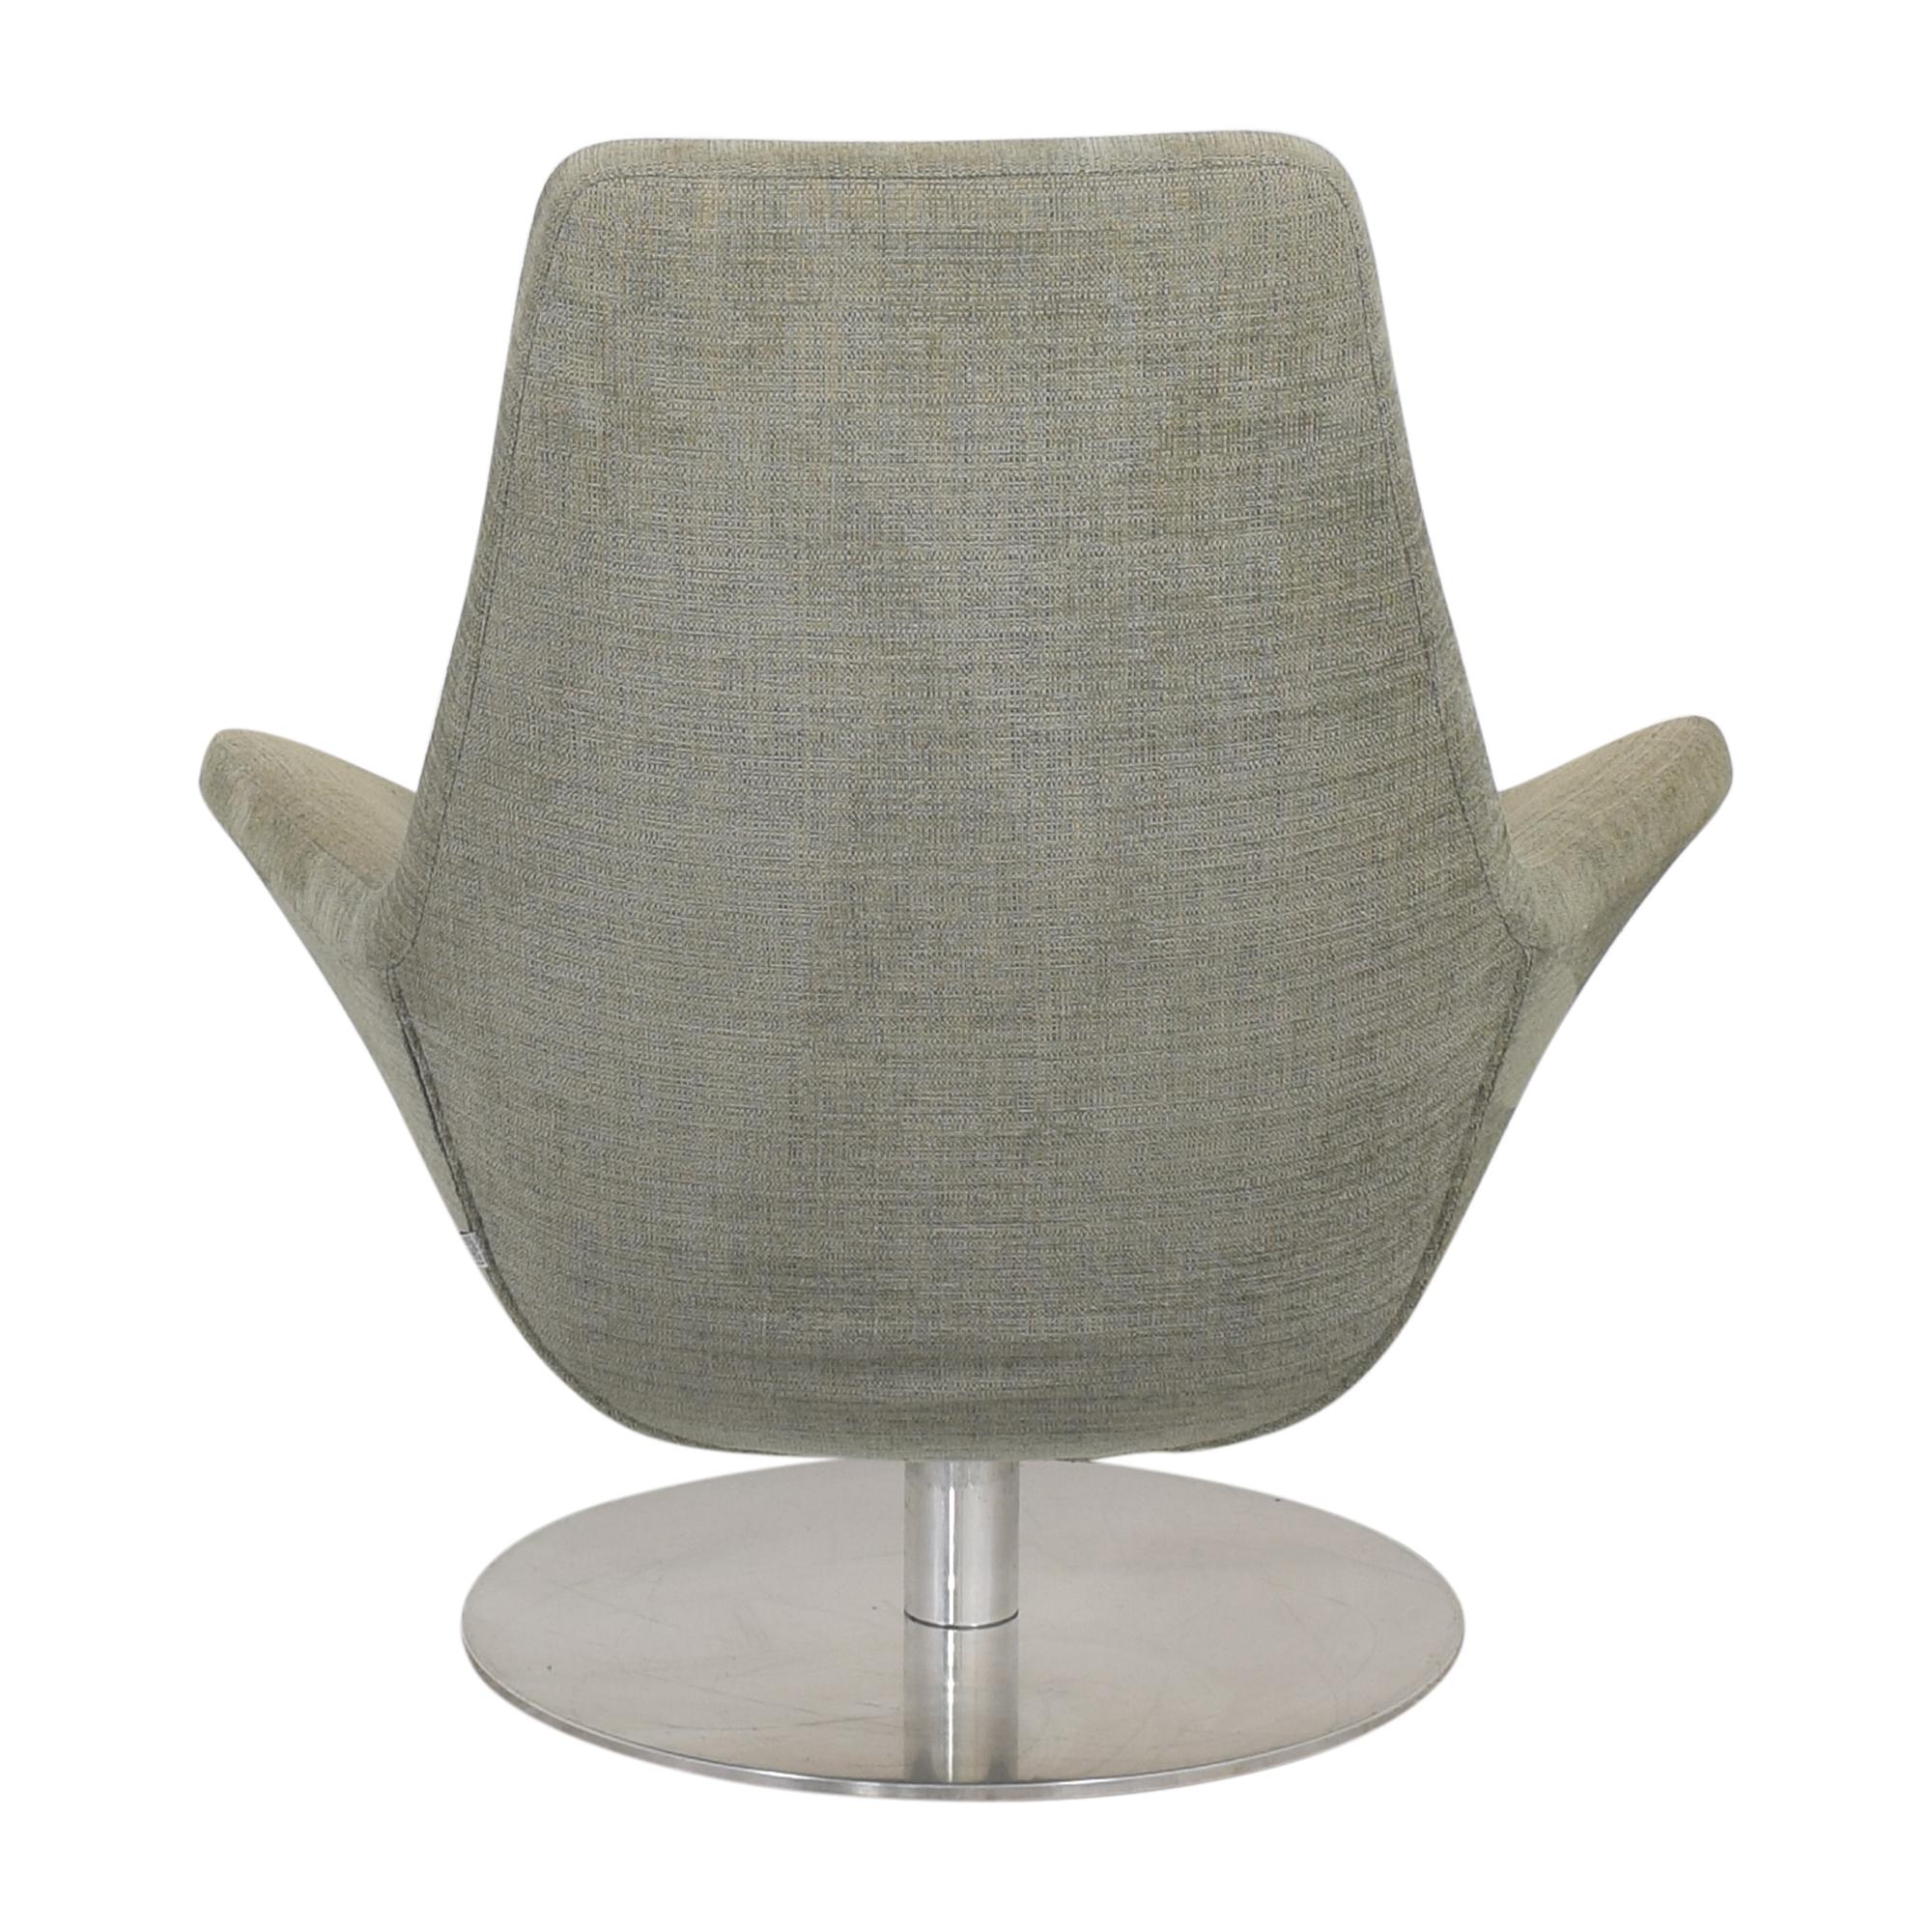 B&B Italia Metropolitan Swivel Chair / Chairs